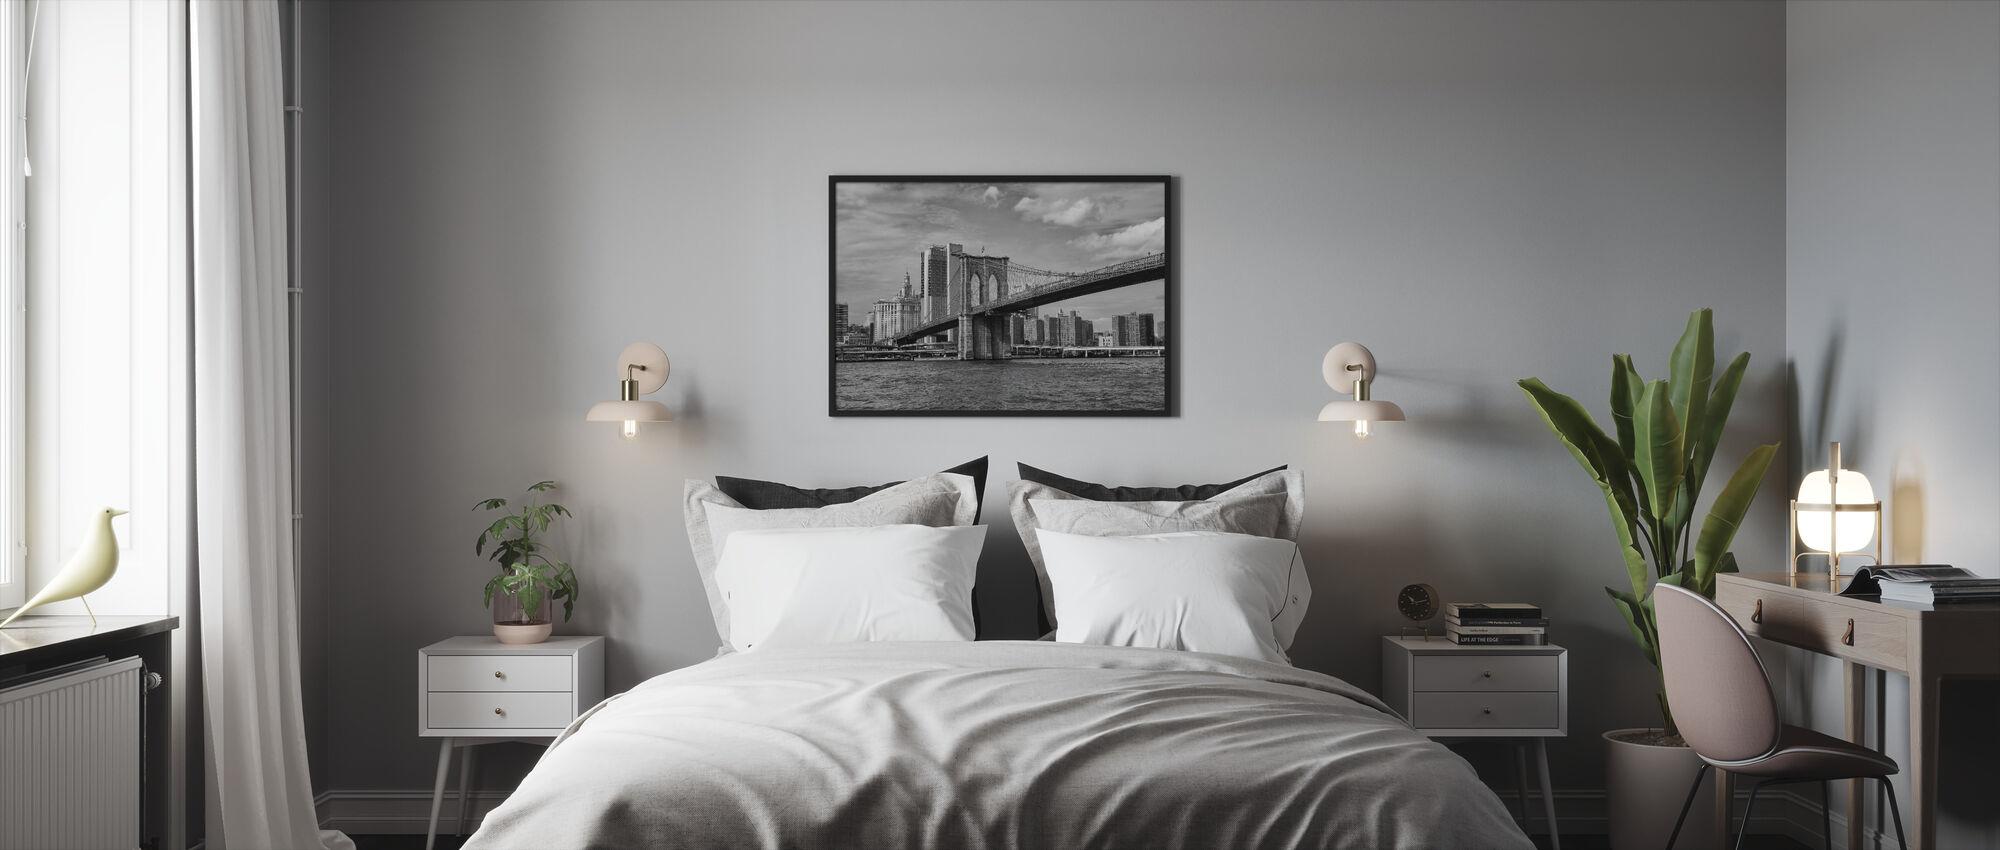 Bridge - Framed print - Bedroom